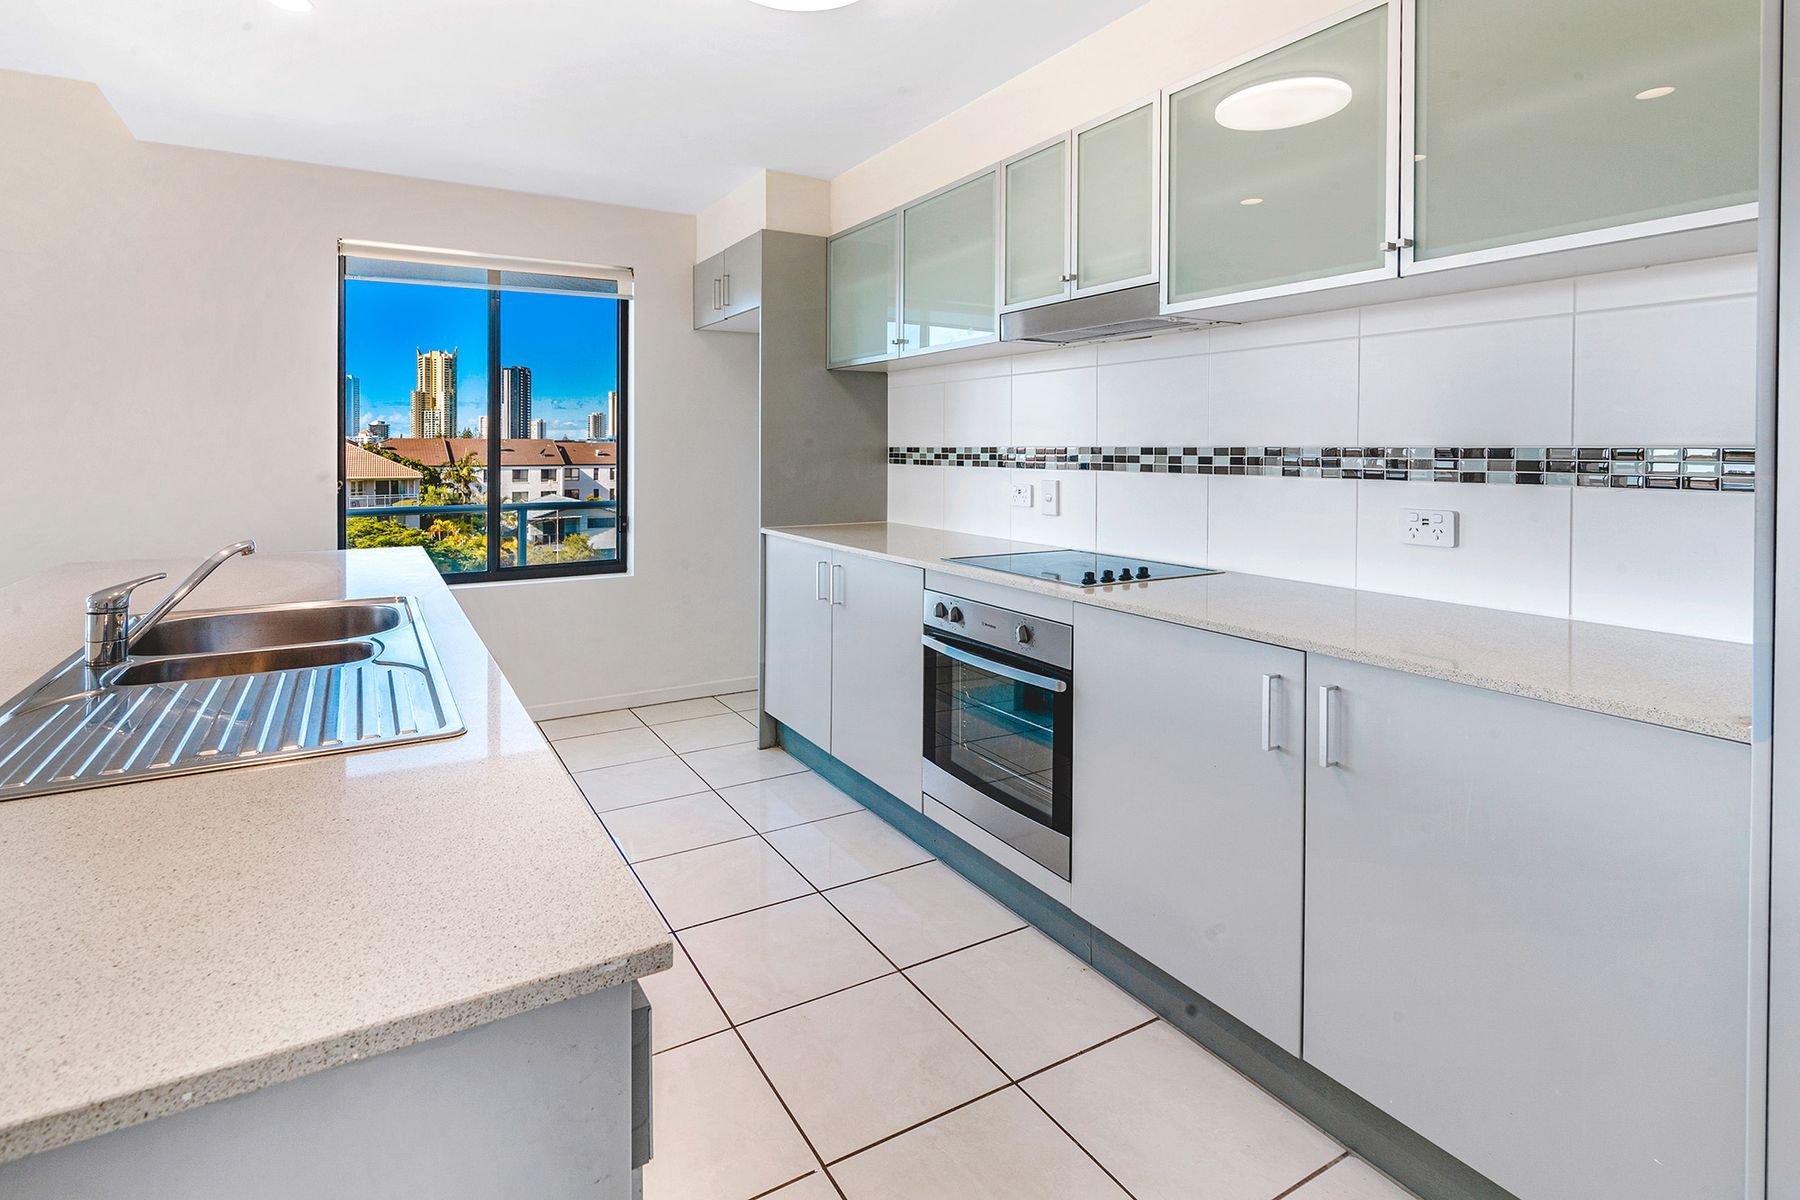 13/43-45 Anembo Street, Chevron Island, QLD 4217